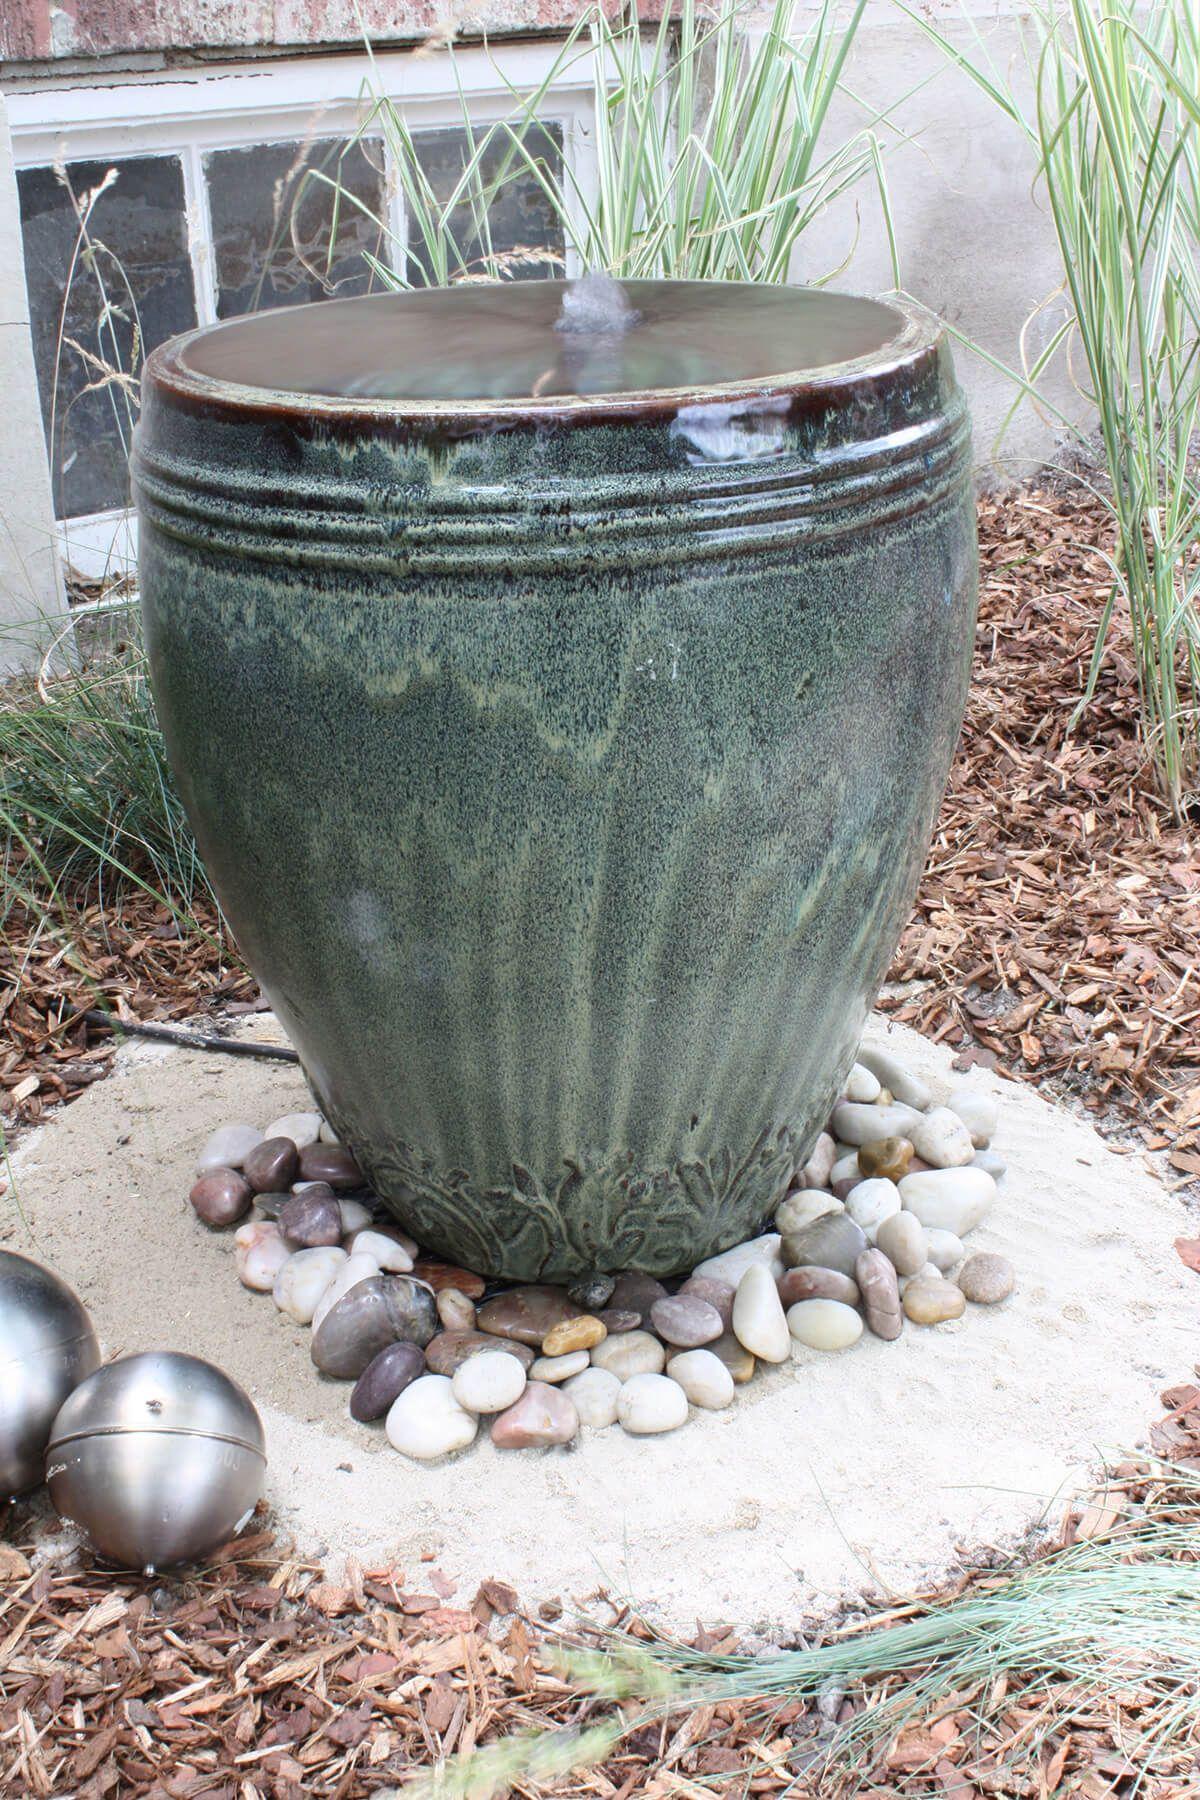 24 Simple And Serene Diy Water Feature Ideas You Ll Love Fountains Backyard Diy Garden Fountains Diy Water Fountain